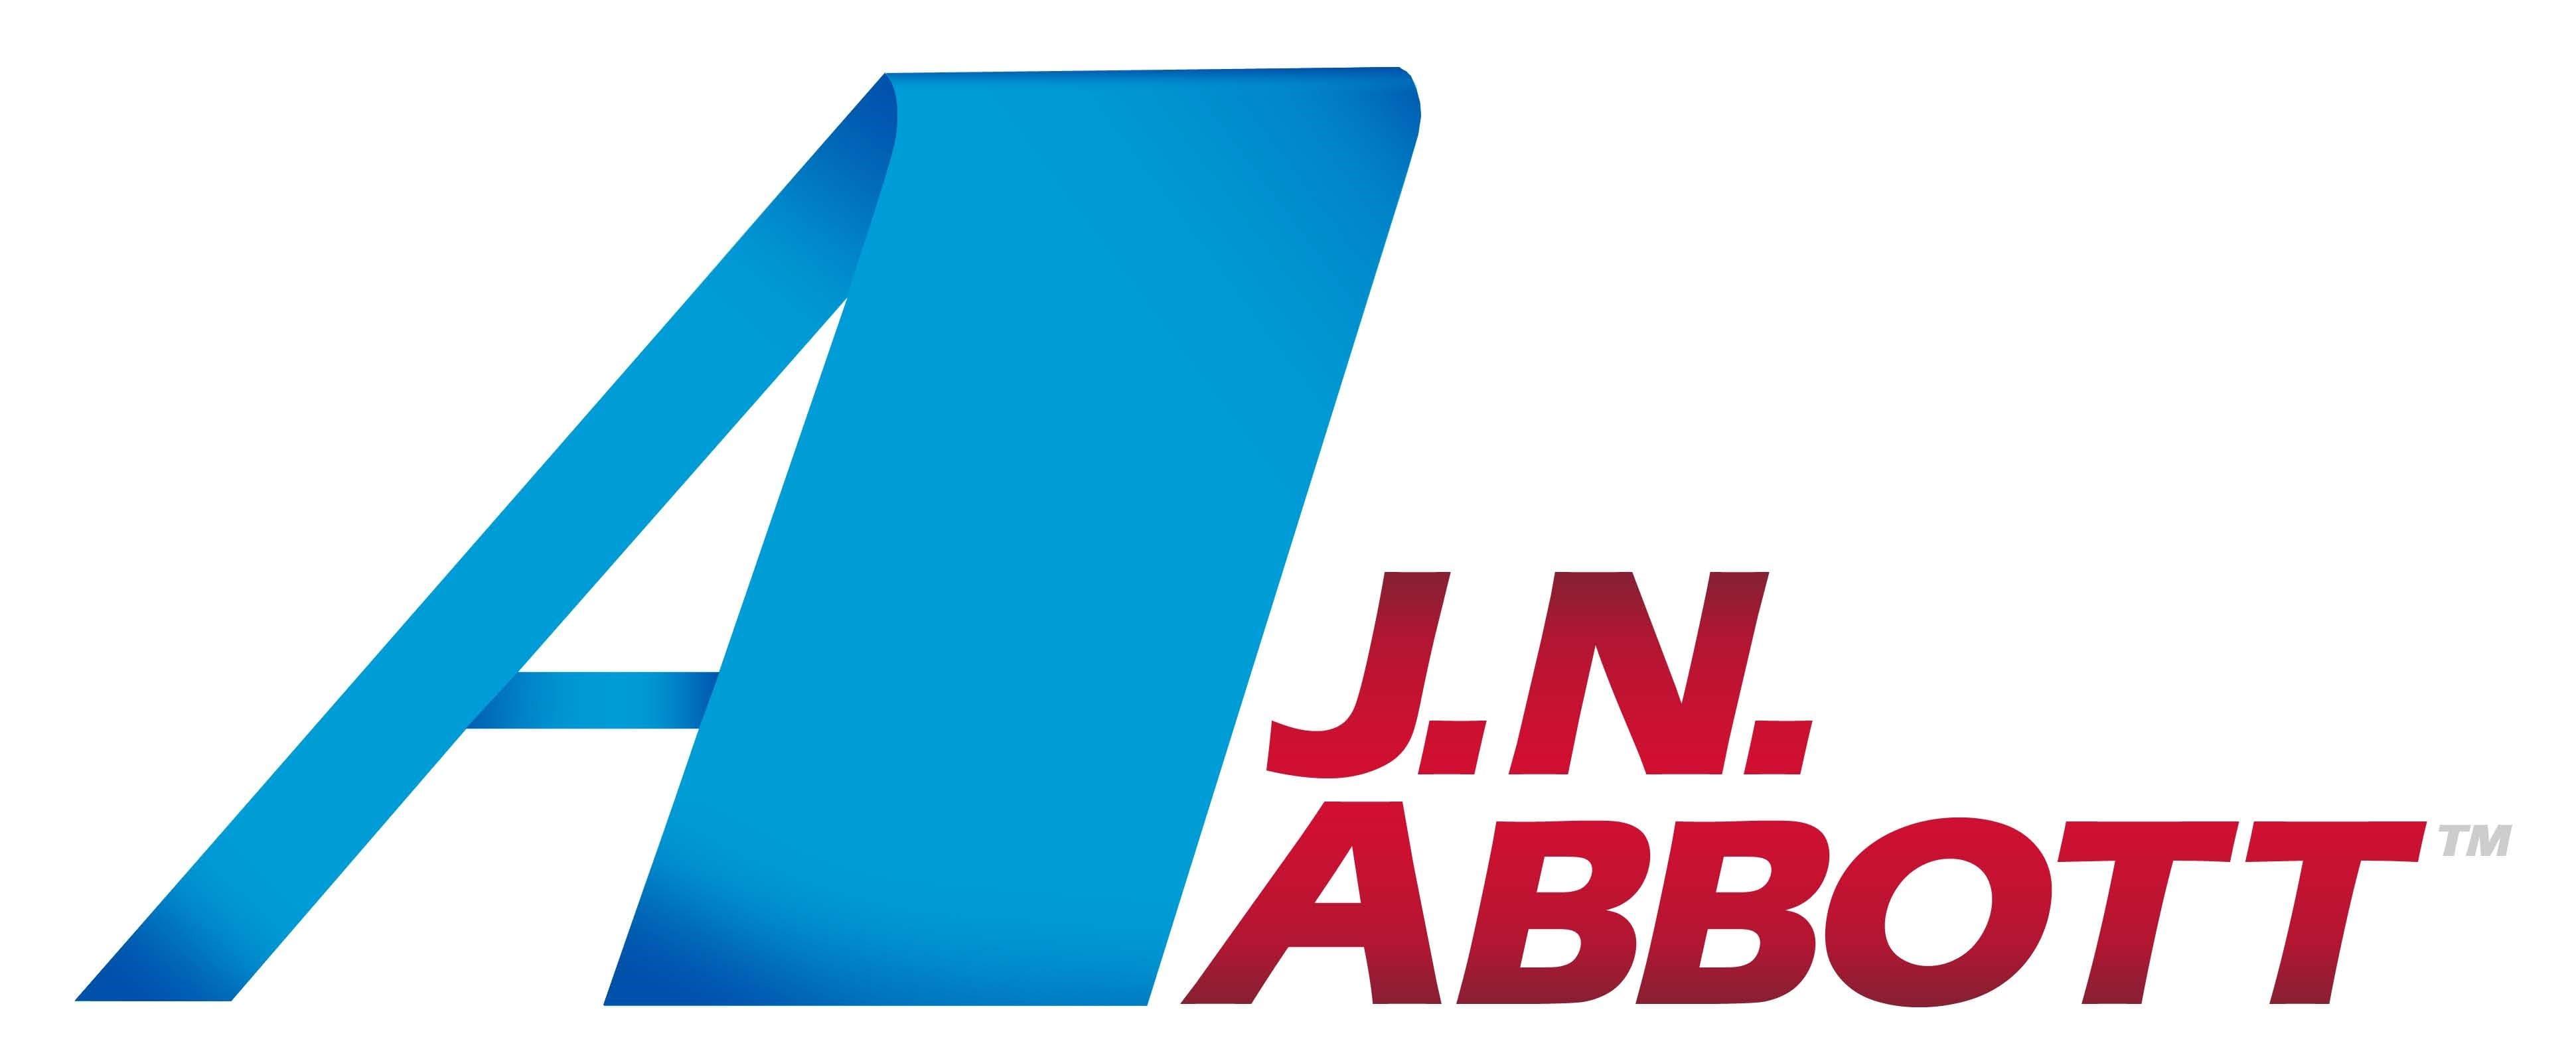 J. N. Abbott.